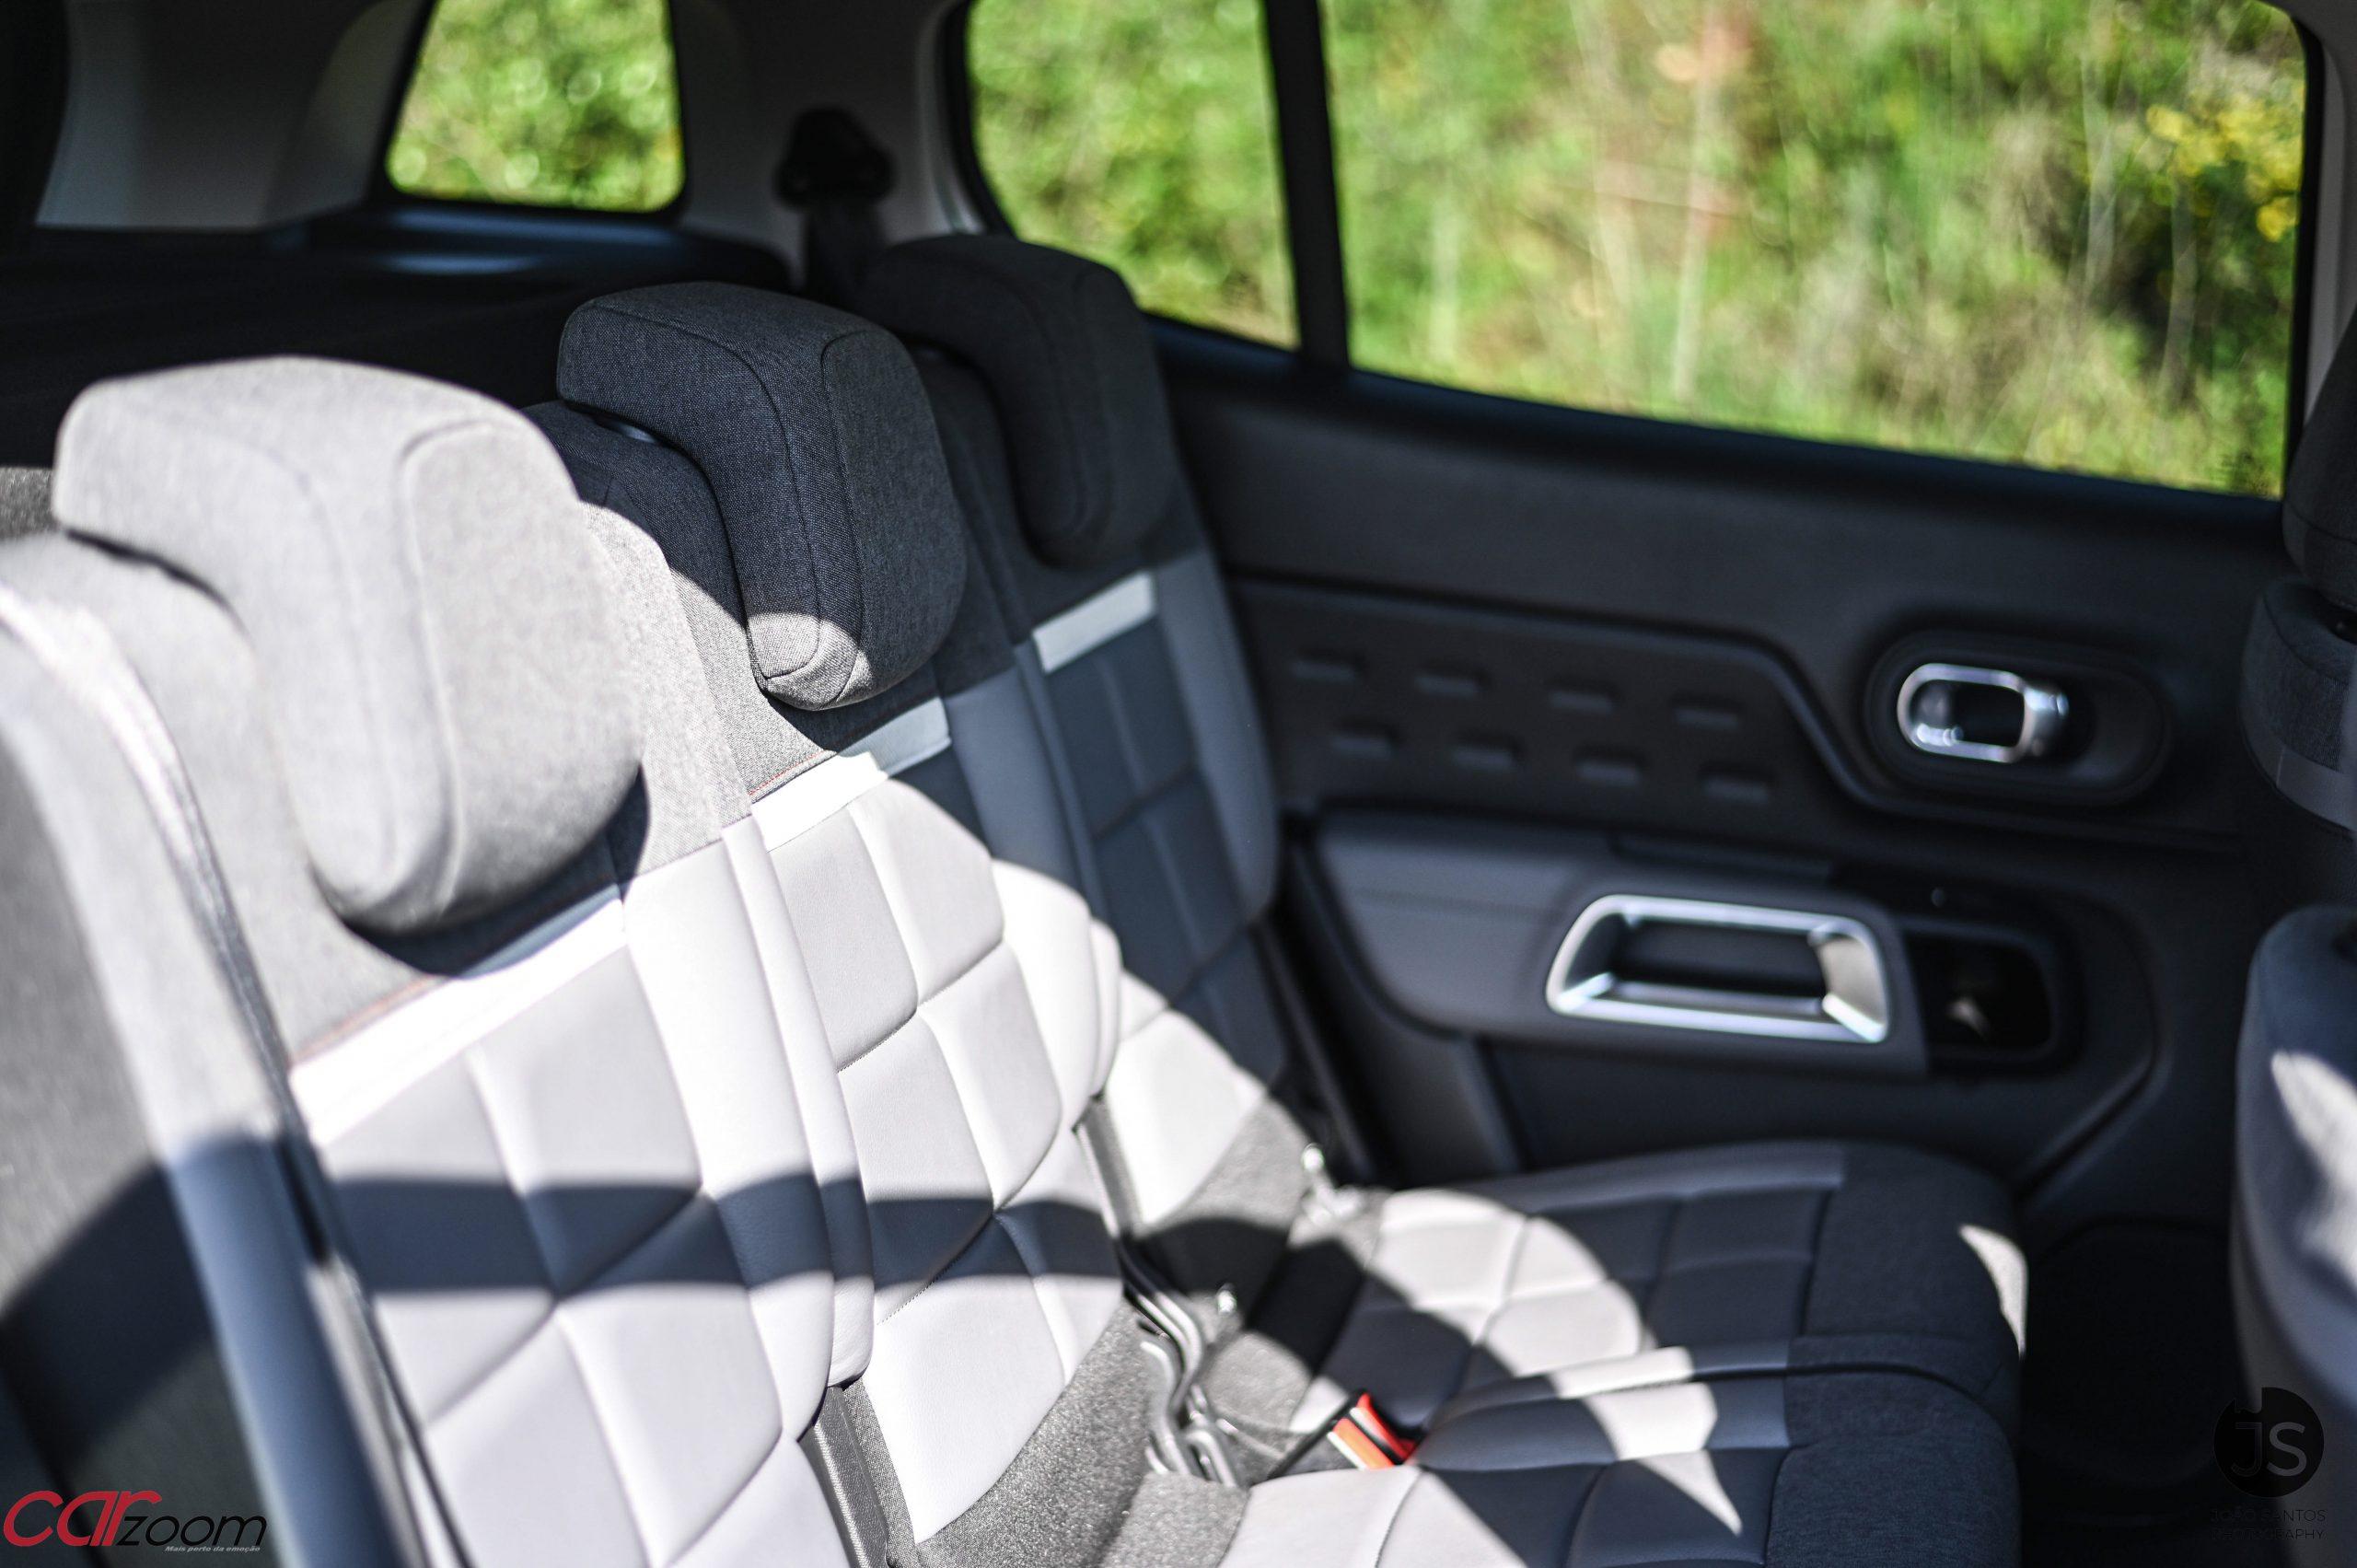 Citroën C5 Aircross Plug-in Hybrid: Um Grande Híbrido! 28